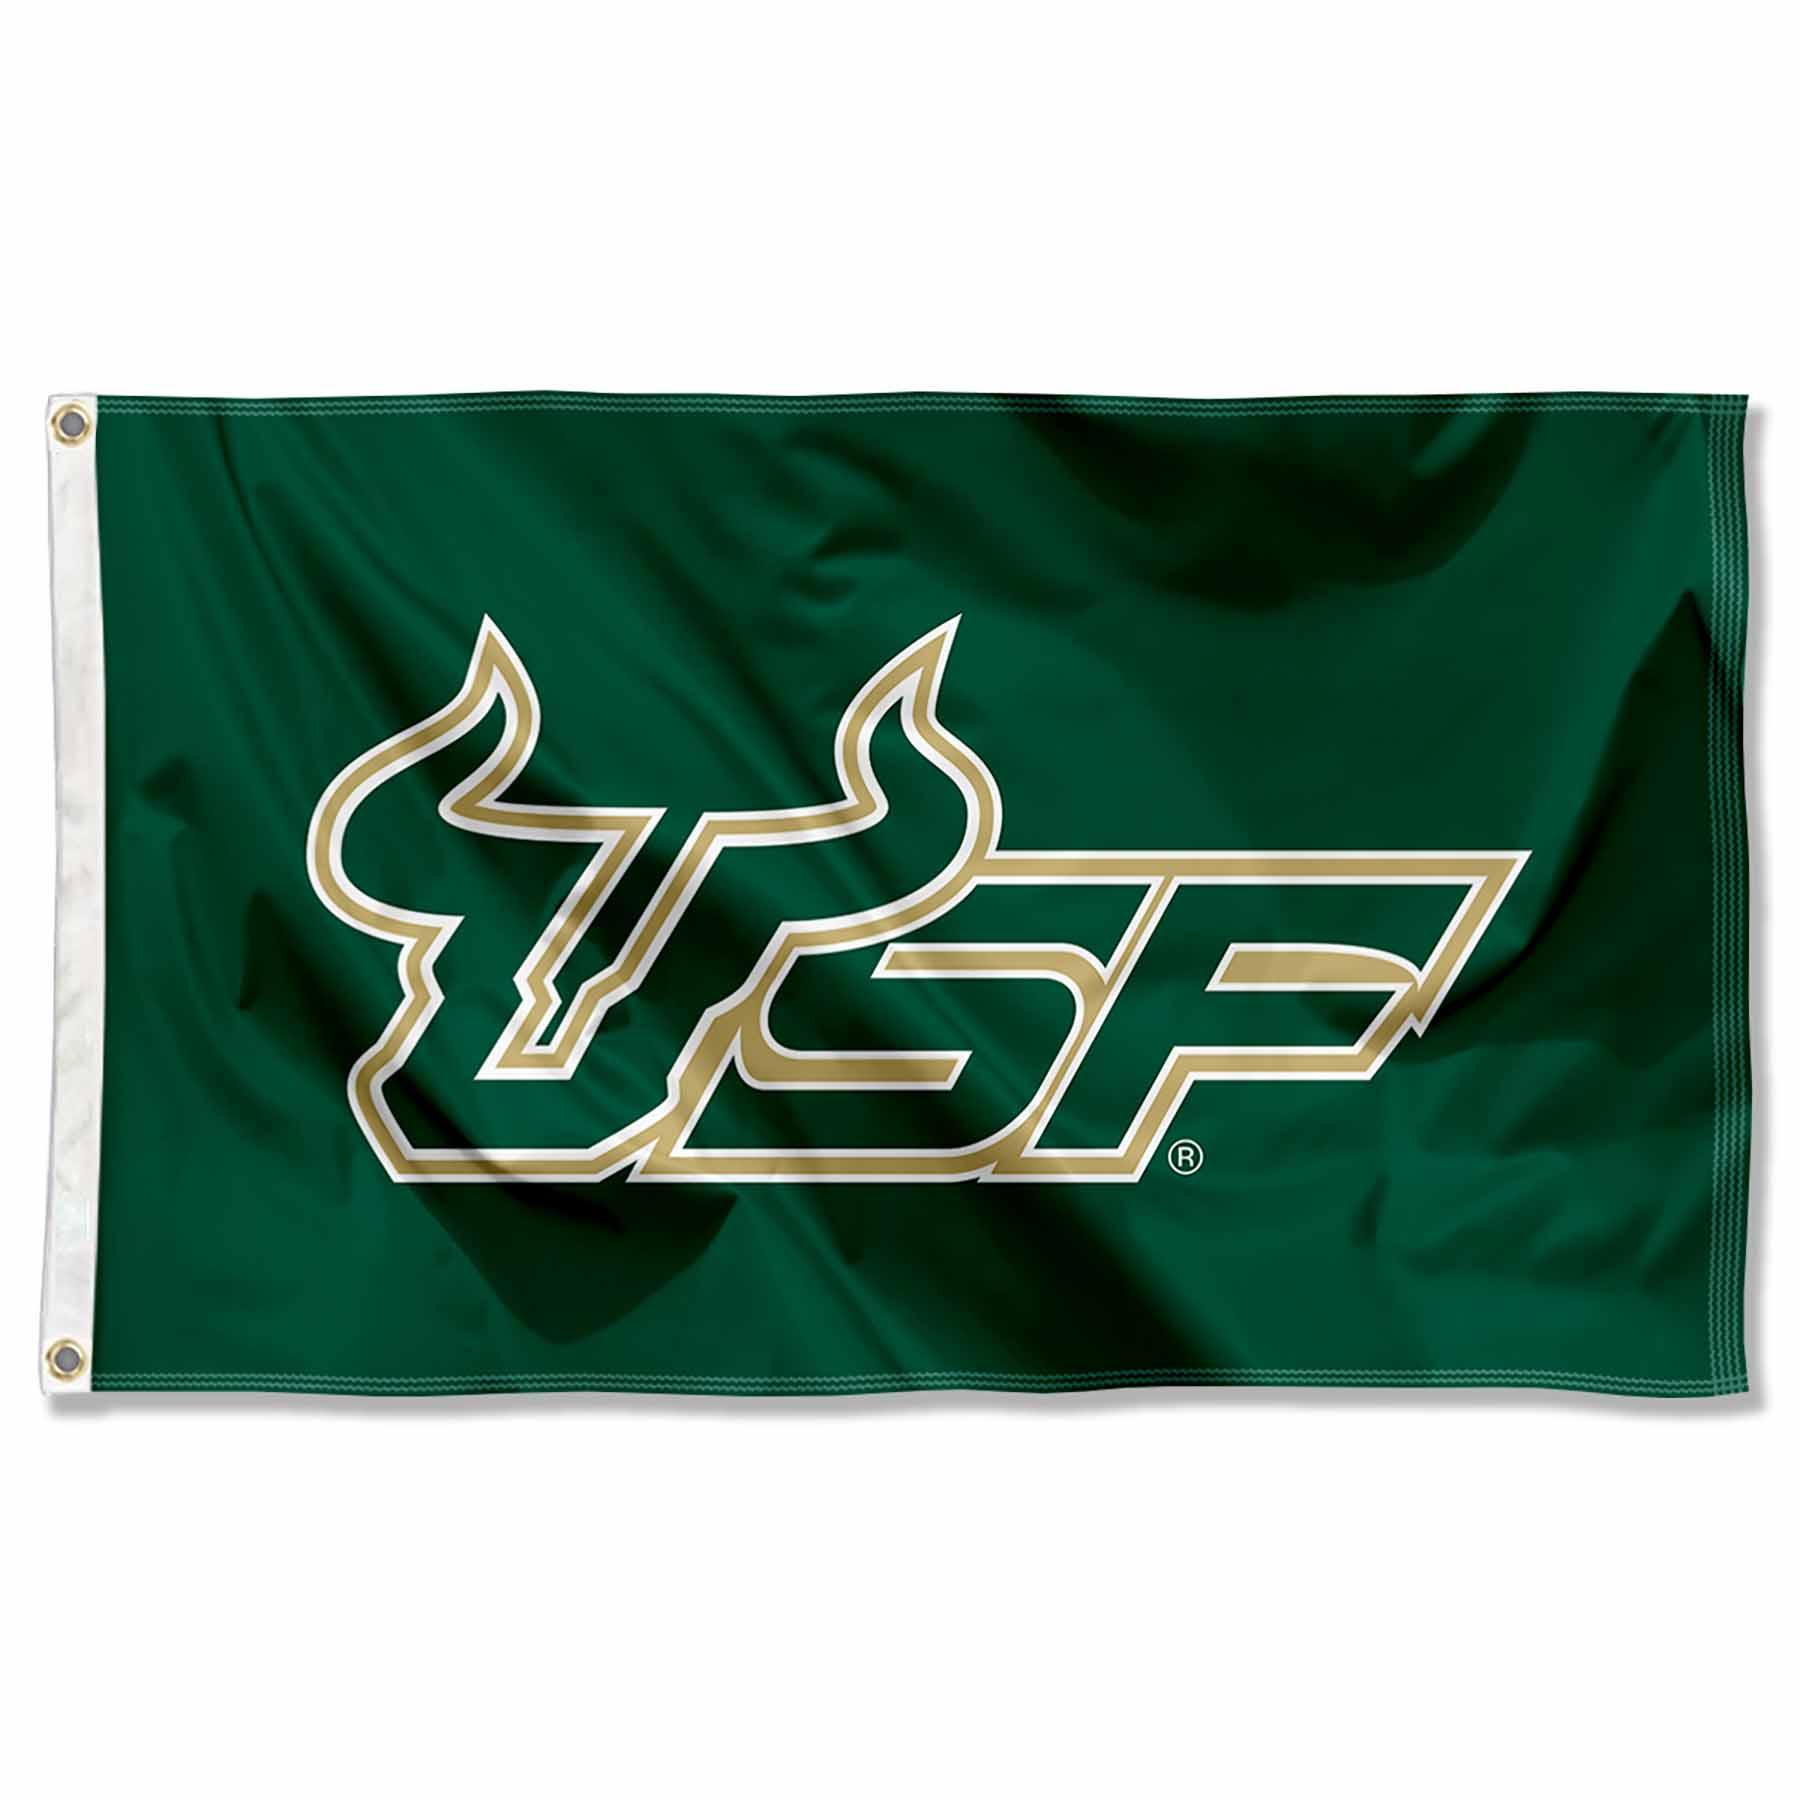 13609a7bf0 University of South Florida Bulls Flag USF Large 3x5 816844016035